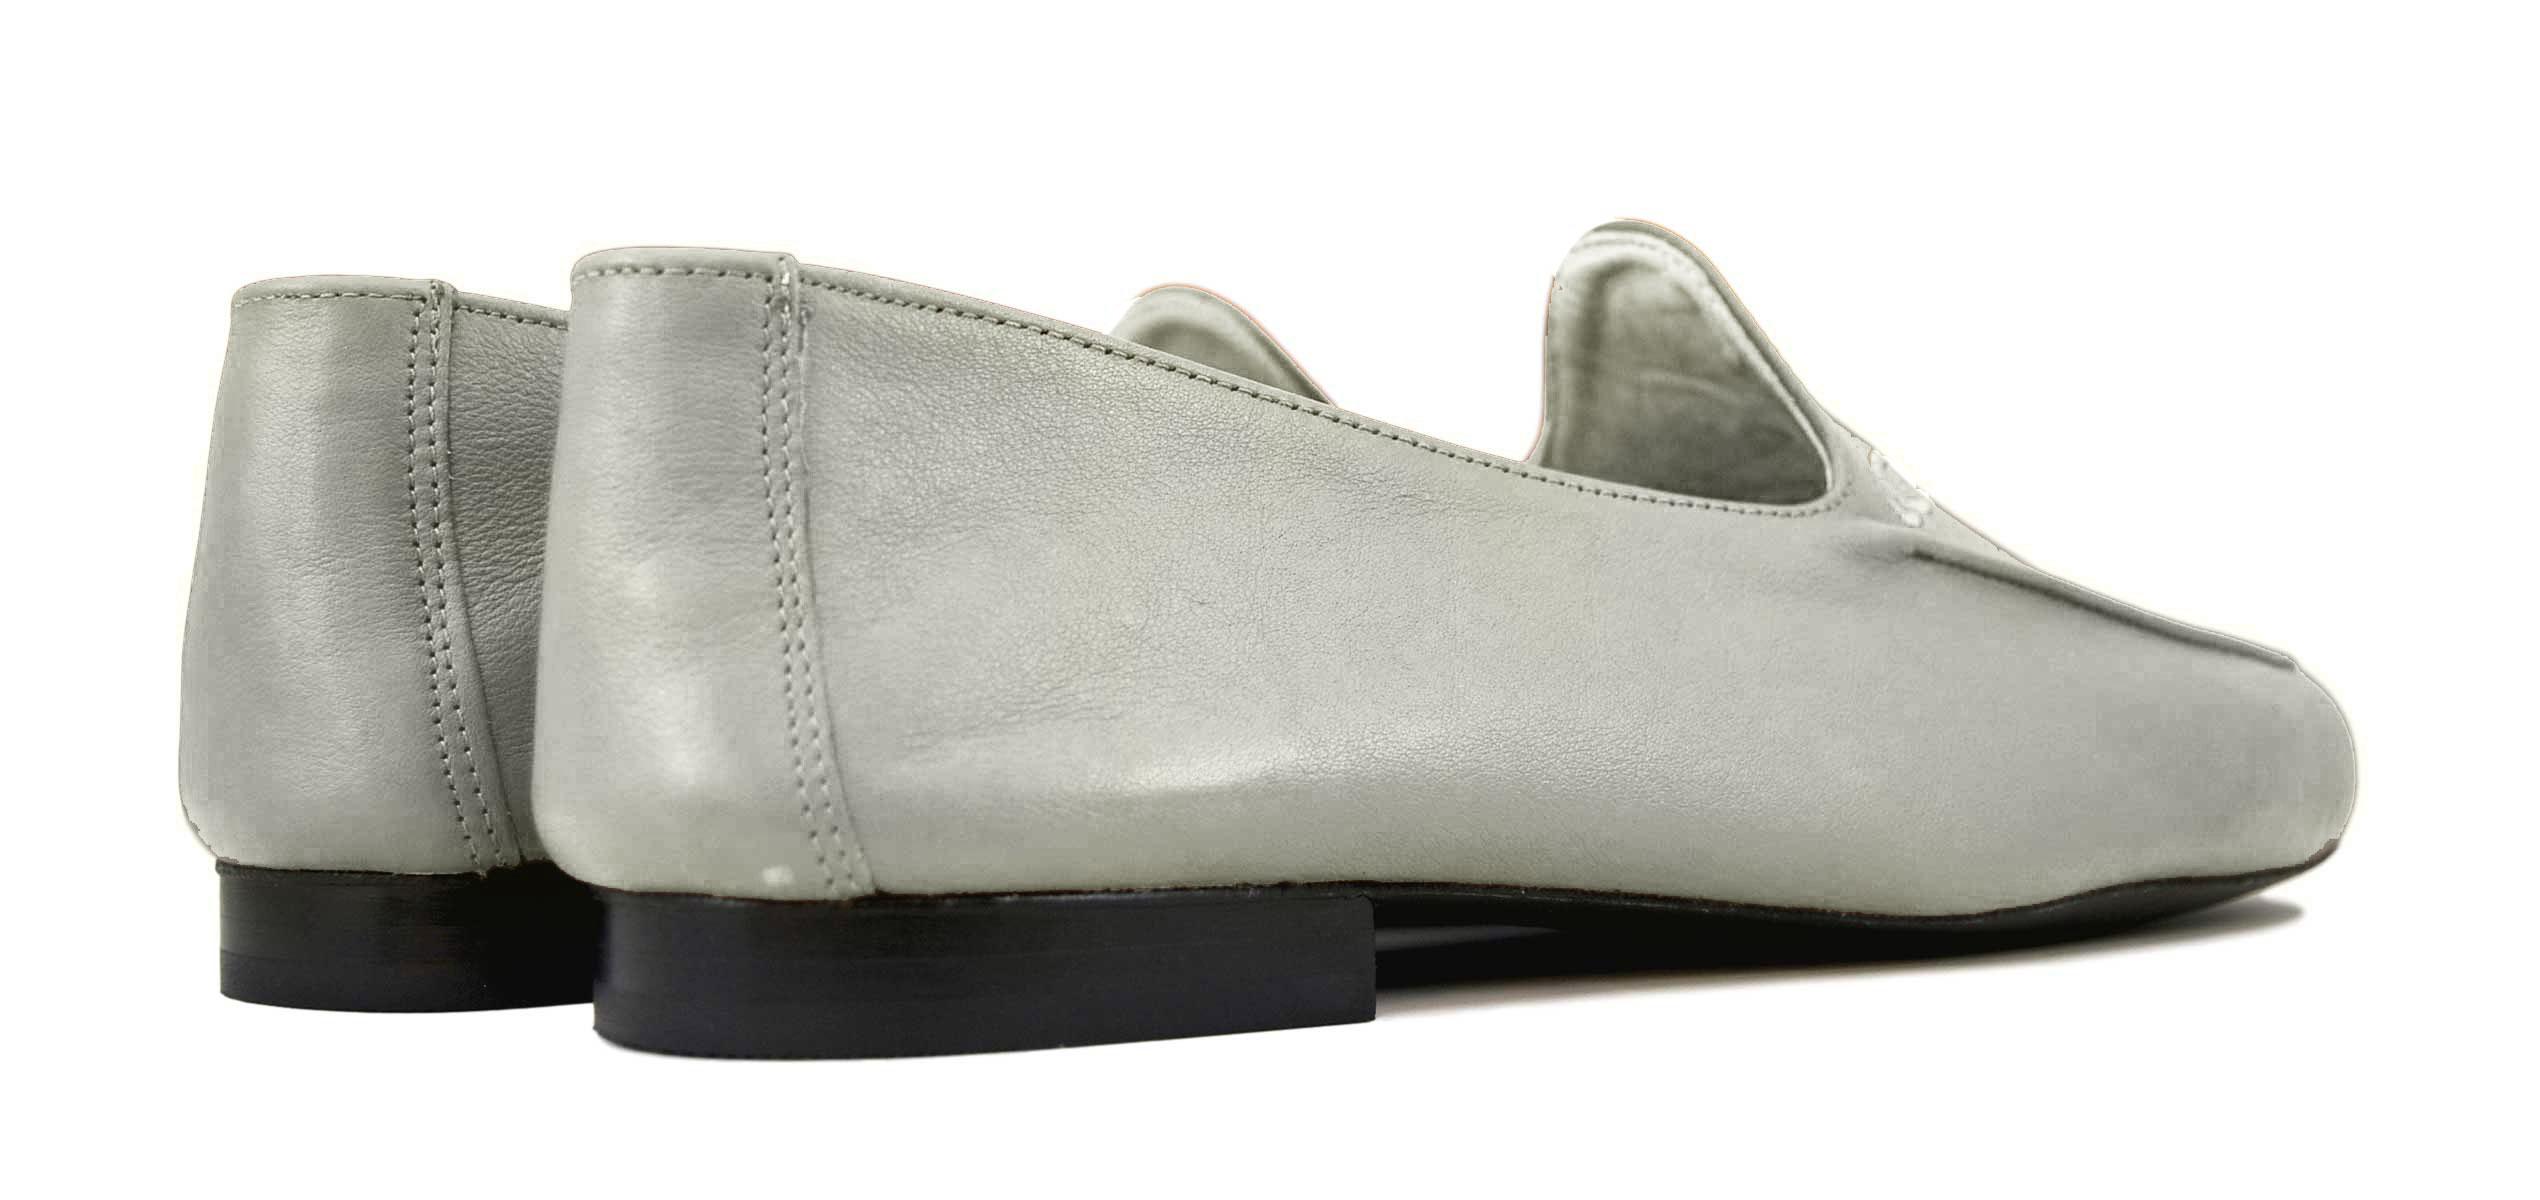 Foto 4 de Zapatos Julio Iglesias 528 JC Perla Napa Mocasin